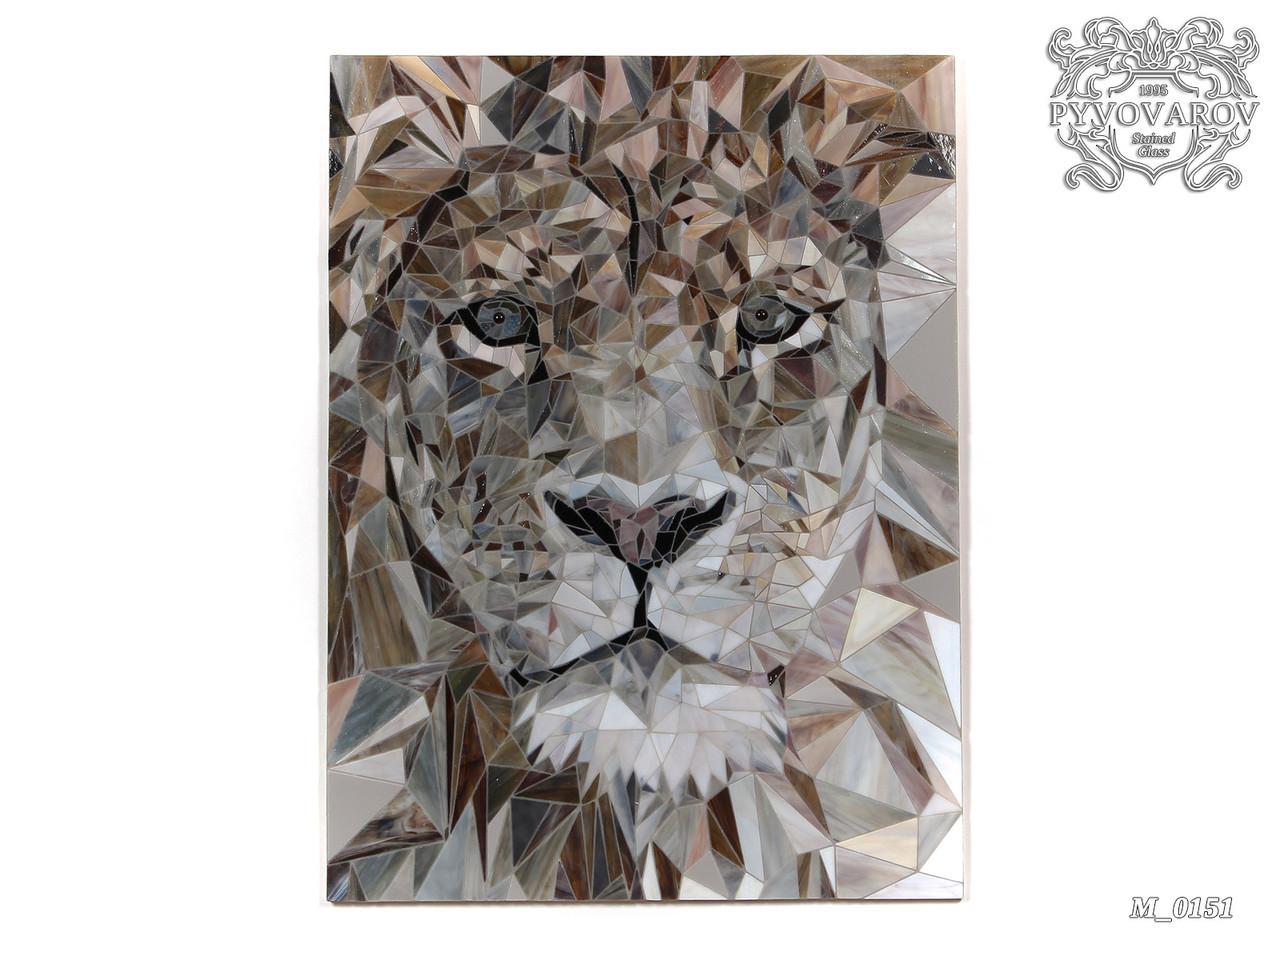 Картина Лев из аппликации цветного стекла